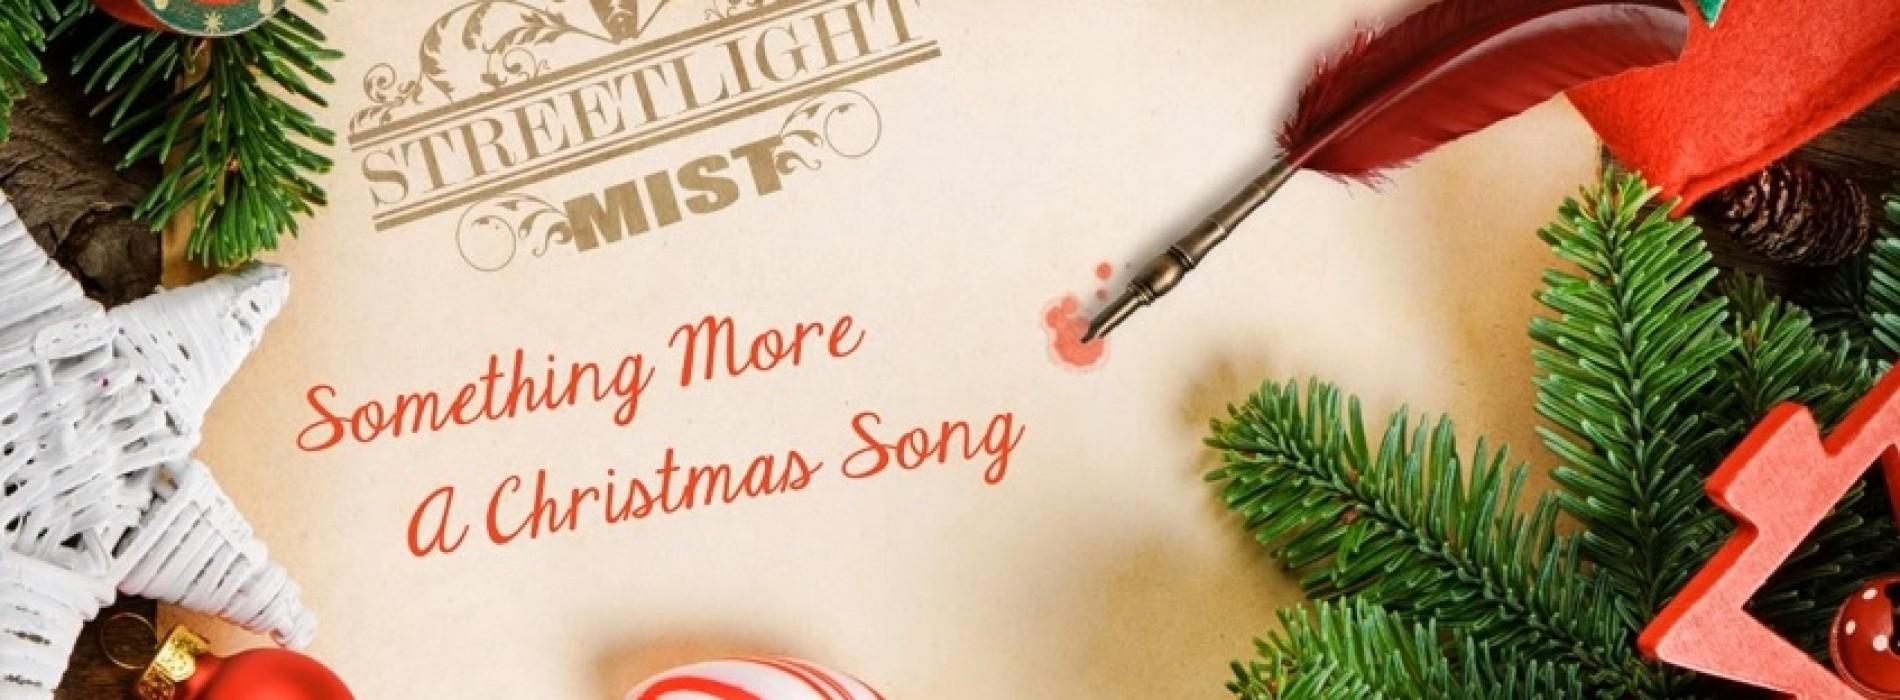 Decibel XMas Picks: #1 – Something More By Street Light Mist